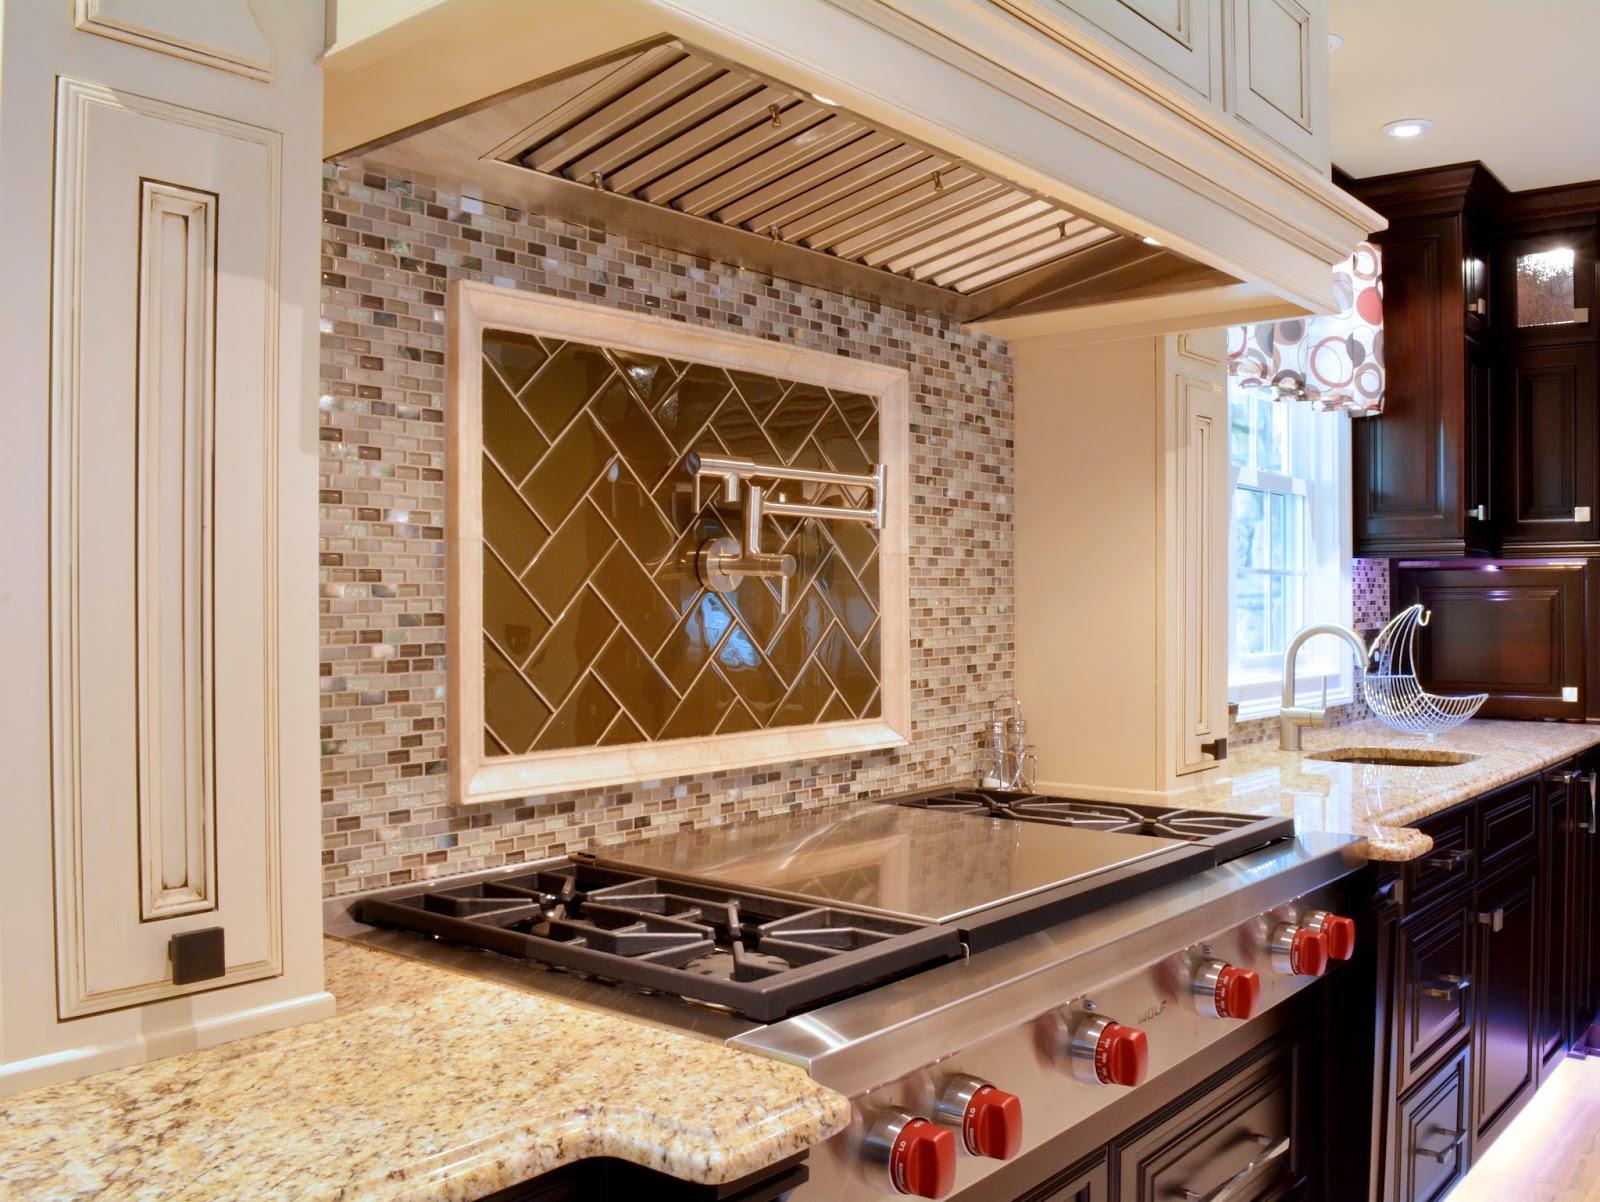 An Inset Tile Frame With Gl Herringbone Pattern Frames The Stainless Steel Pot Filler And Provides Elegant Detail For Range Top Backsplash